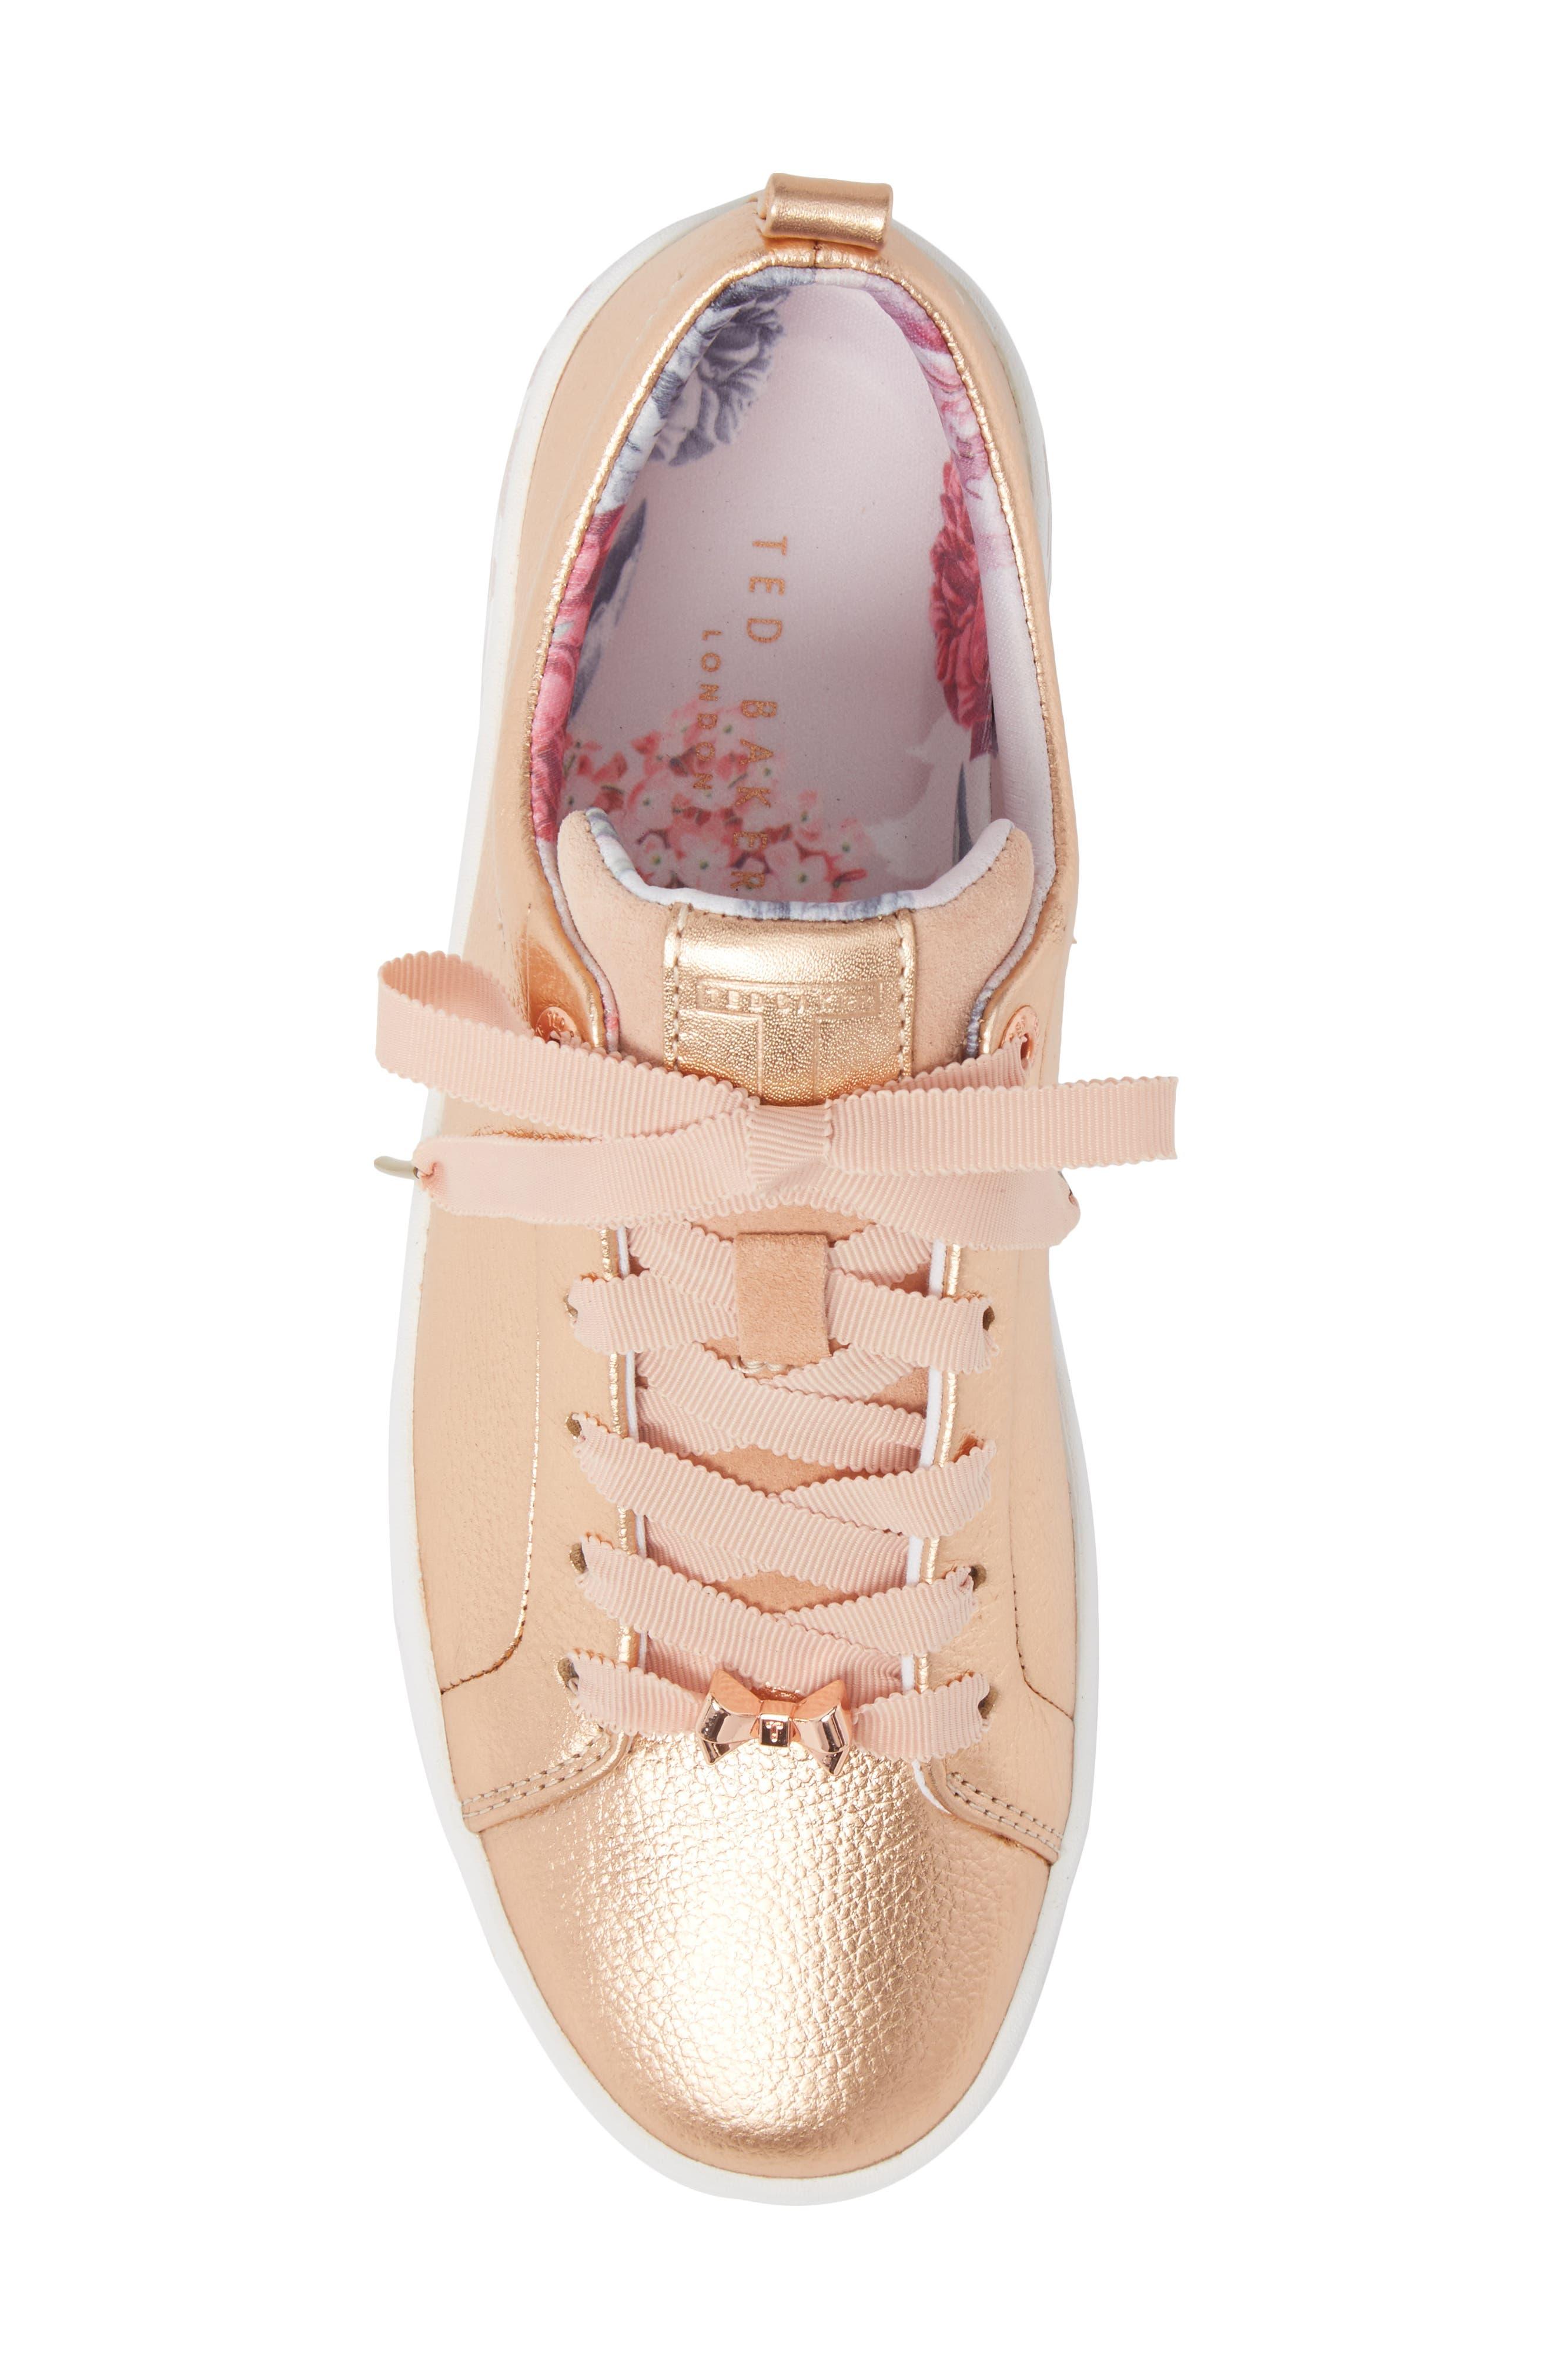 Kelleip Sneaker,                             Alternate thumbnail 5, color,                             ROSE GOLD/ PALACE GARDENS